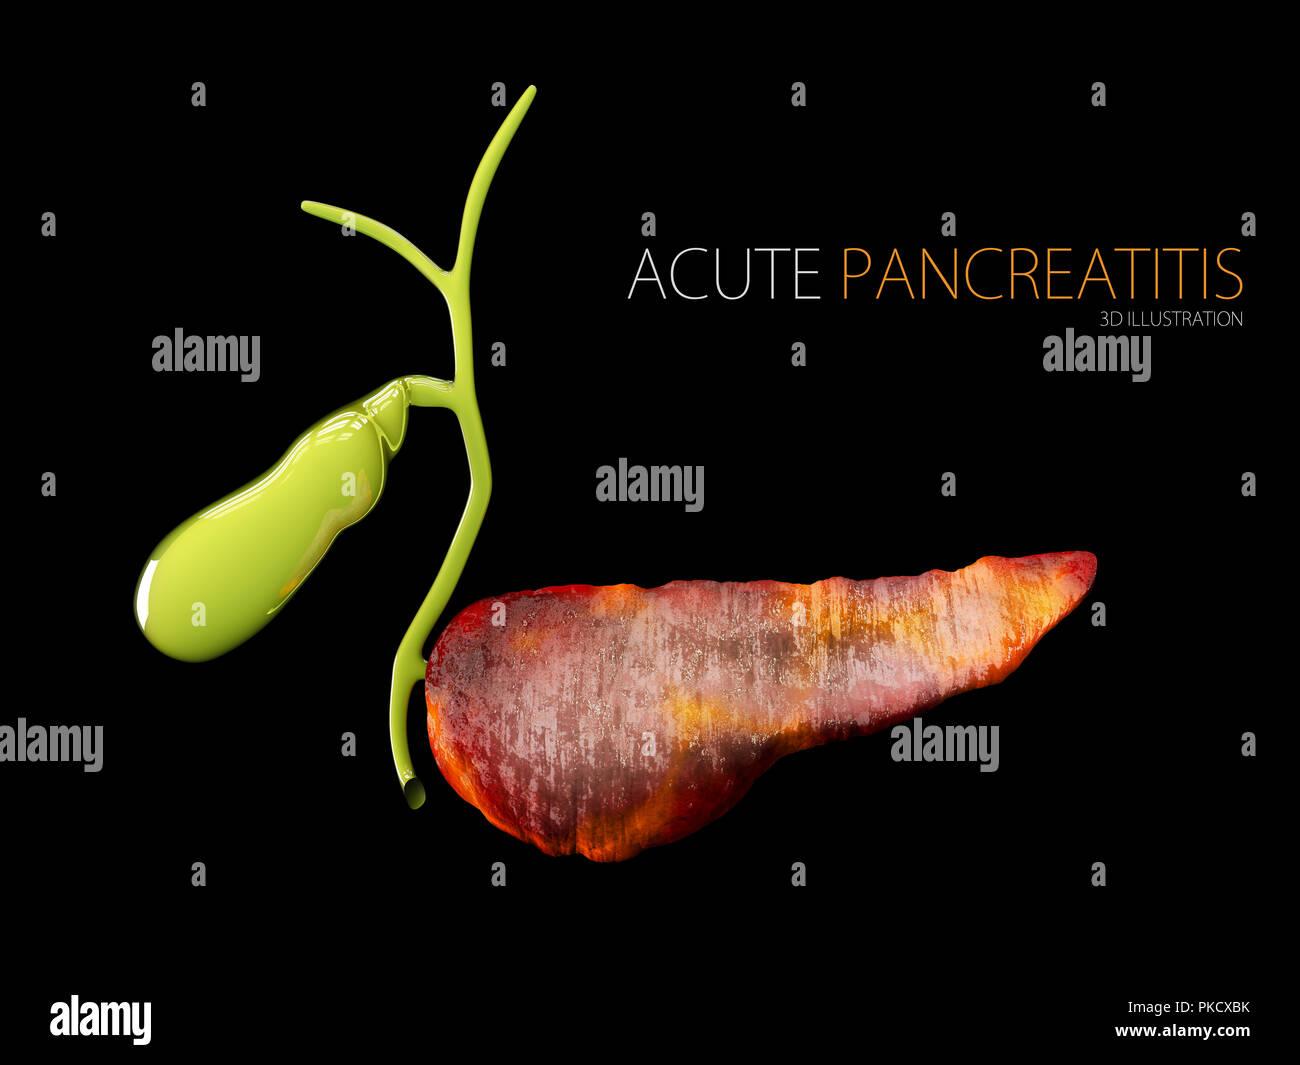 Acute pancreatitis 3d illustration, inflammation of pancreas on a black background - Stock Image